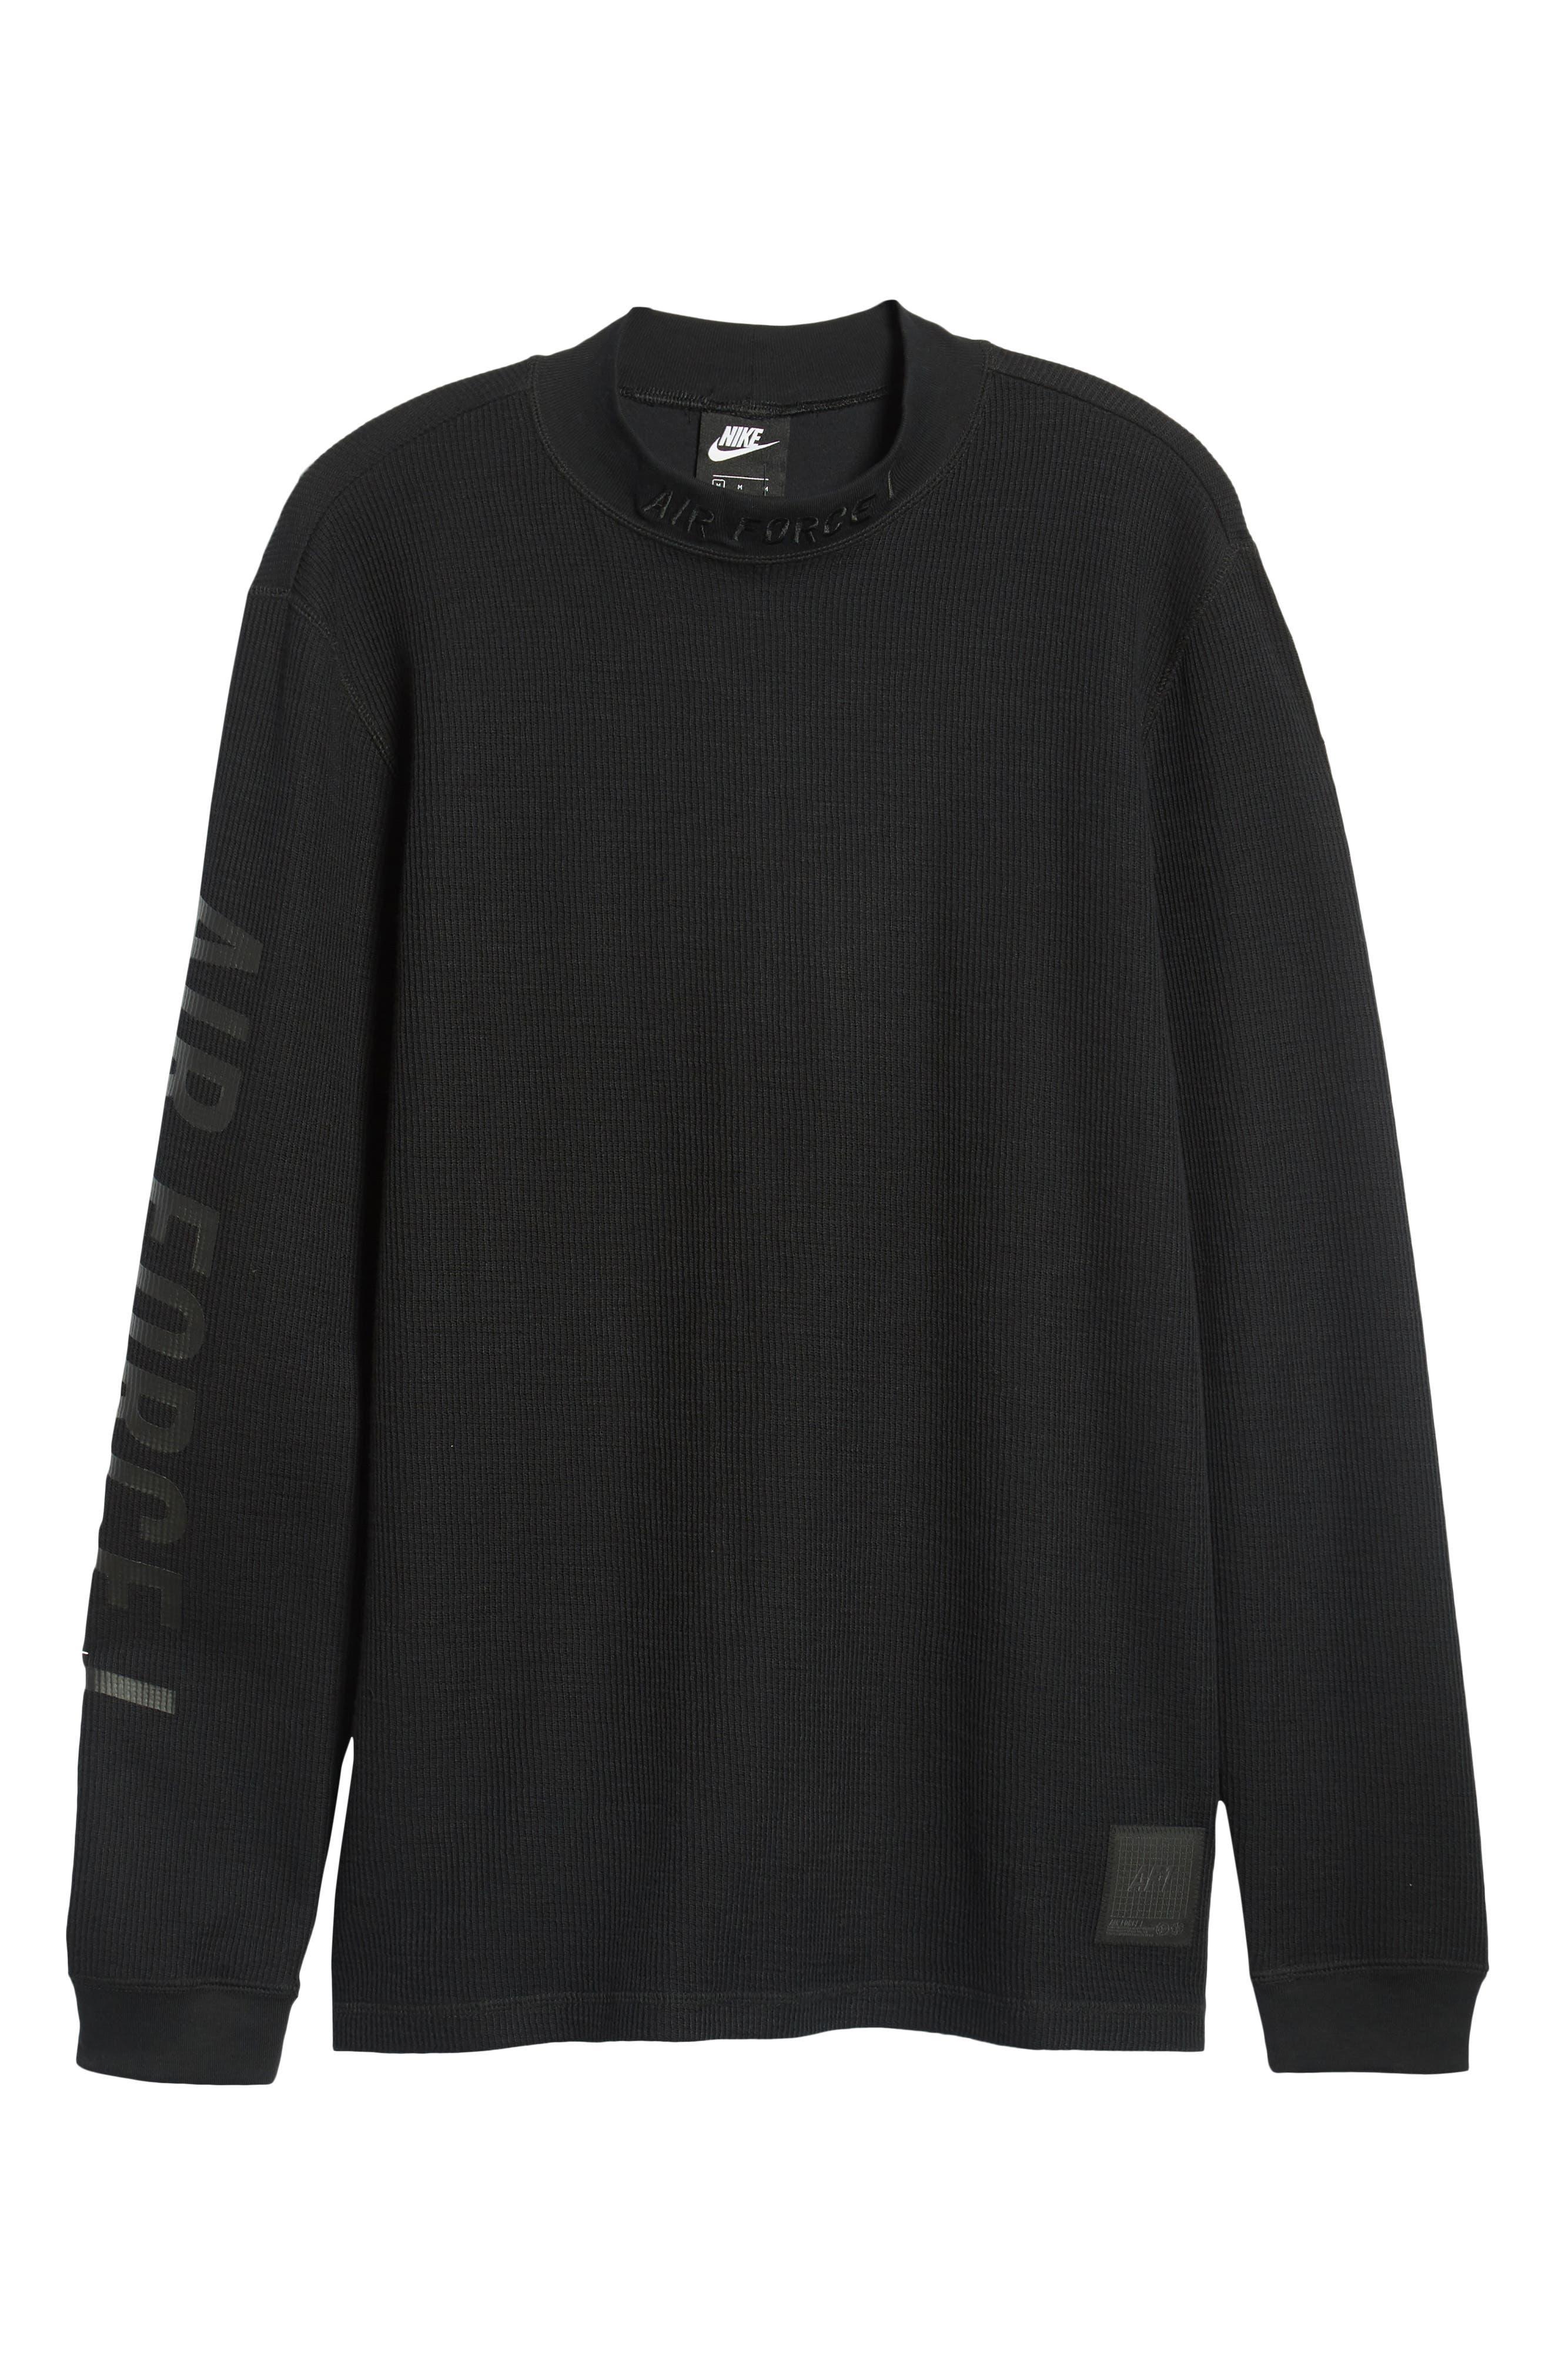 Sportswear Air Force 1 Long Sleeve Top,                             Alternate thumbnail 6, color,                             BLACK